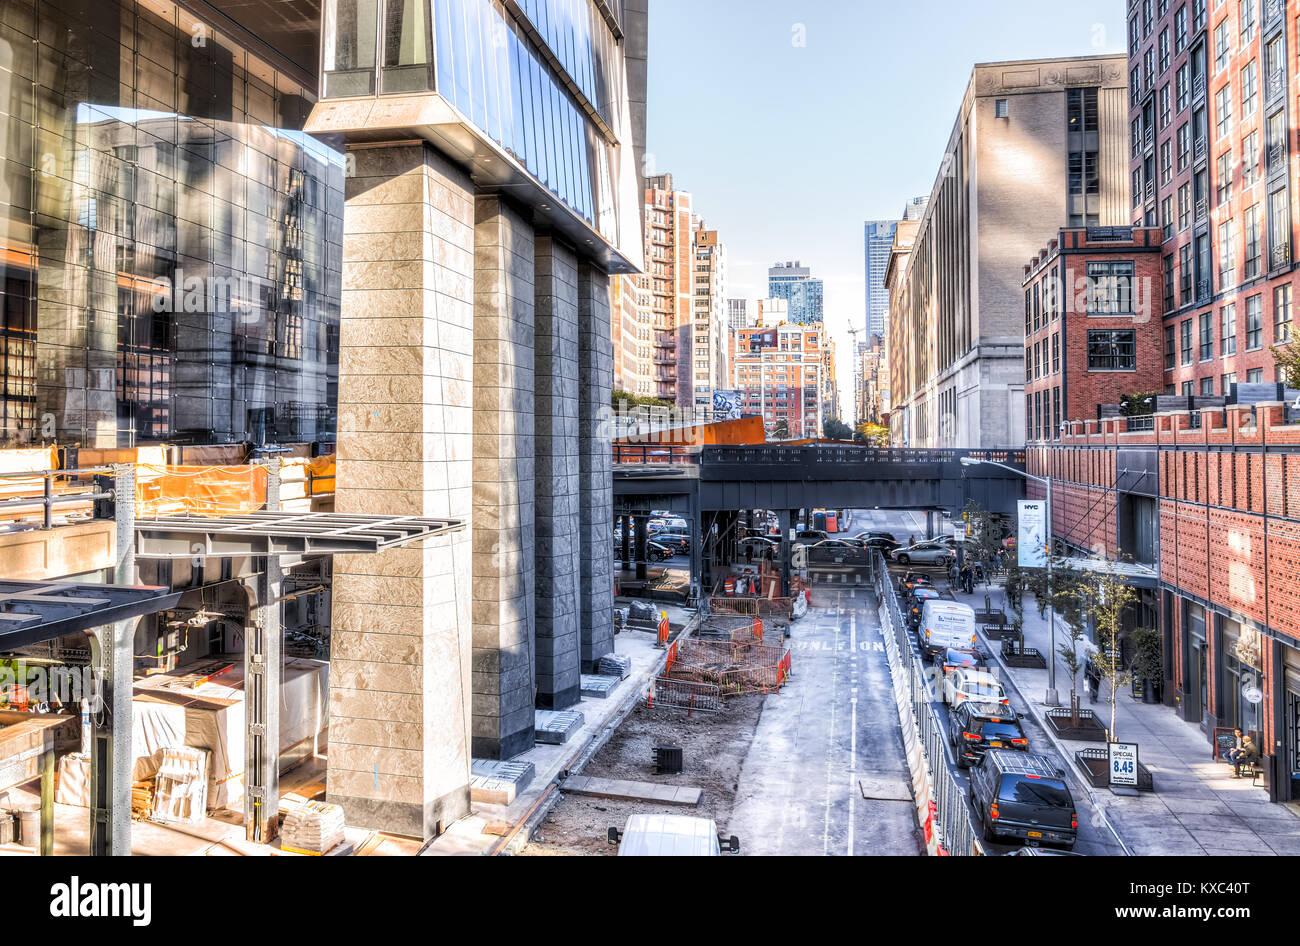 New York City, USA - 27. Oktober 2017: Luftaufnahme der modernen Chelsea Nachbarschaft Bau Gebäude, Parkplätze Stockbild